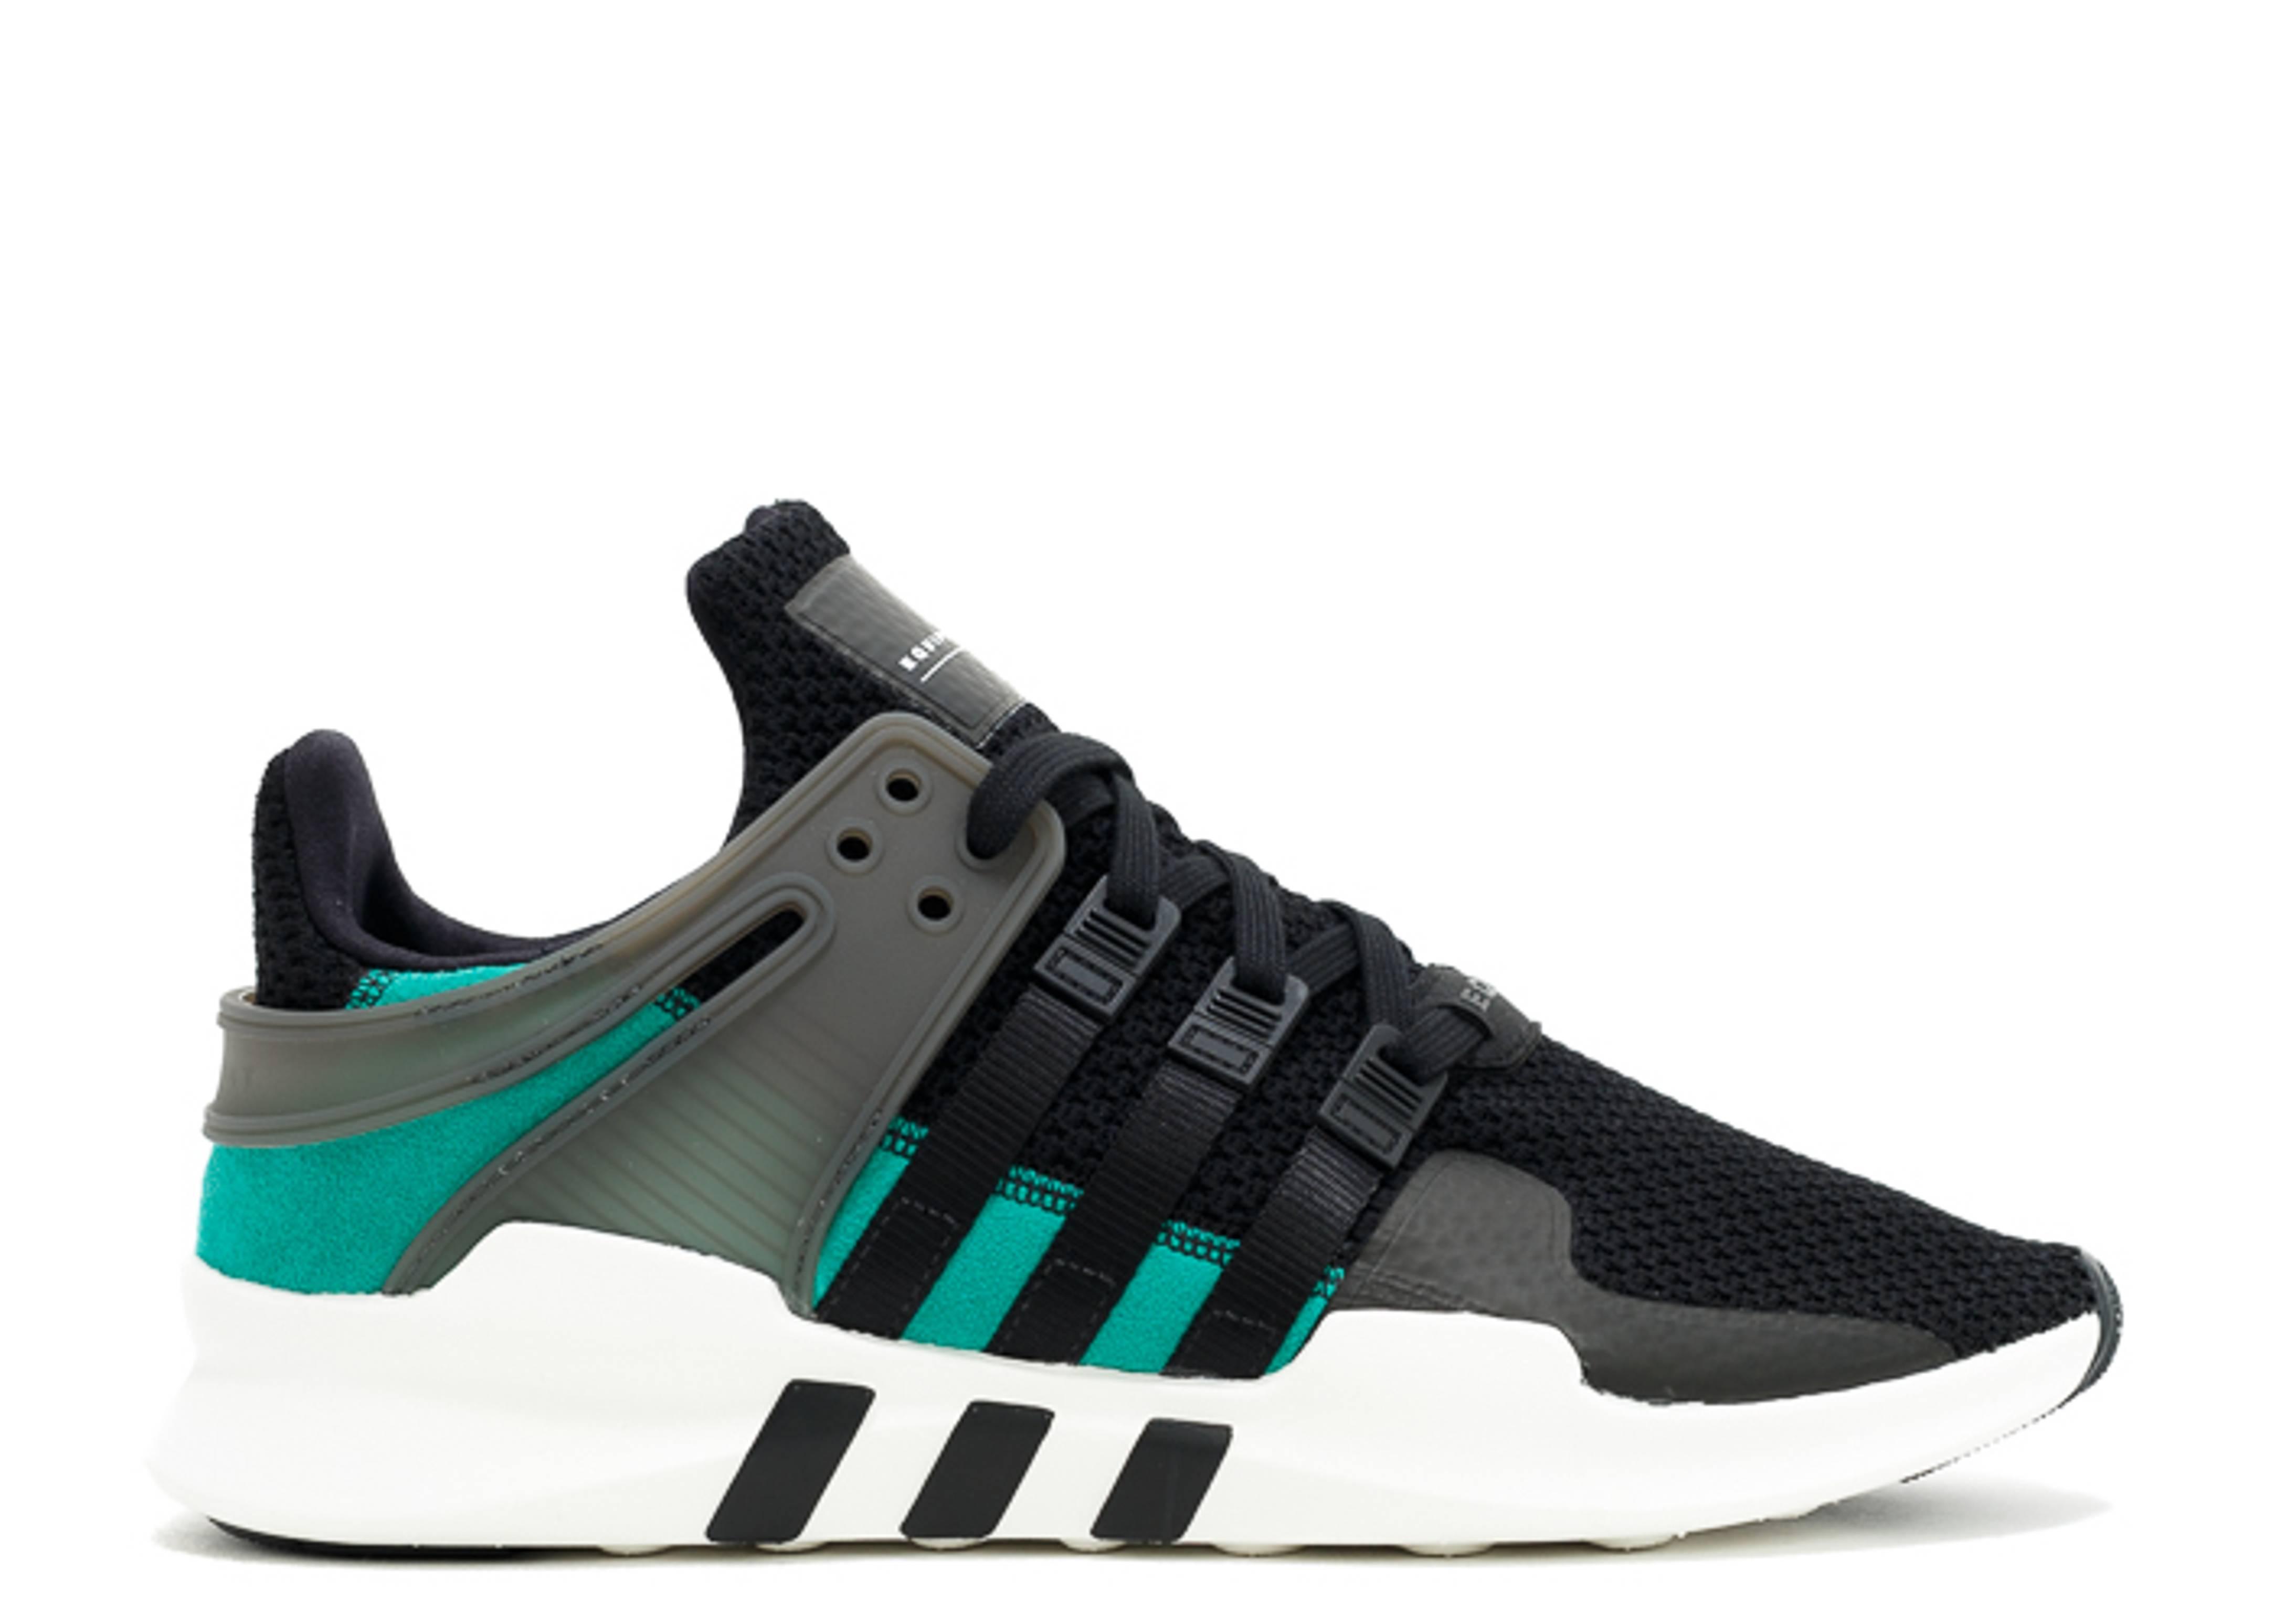 adidas equipment shoes